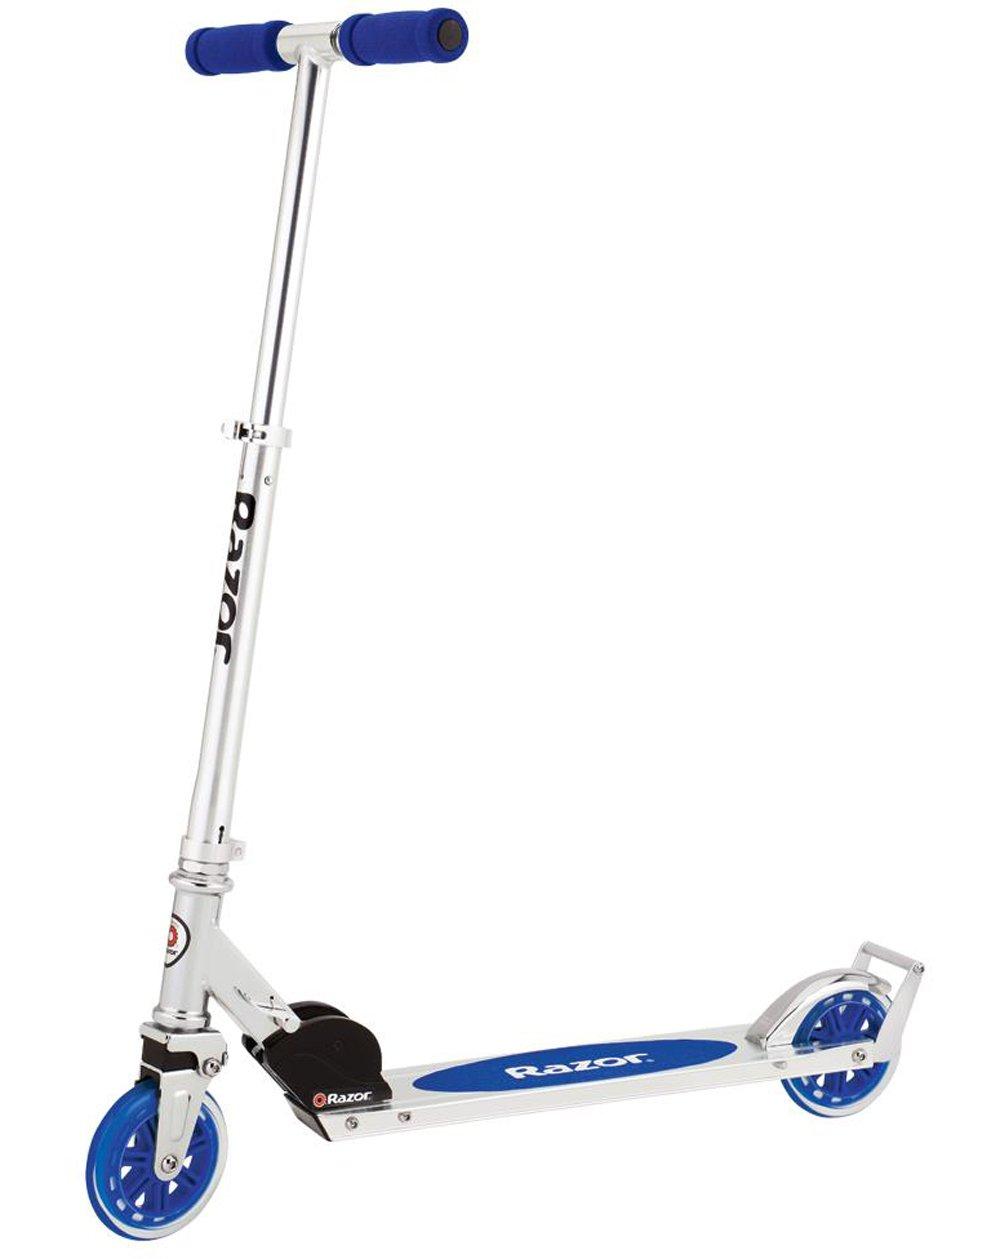 Razor A3 Kick Scooter (Blue) 13014340